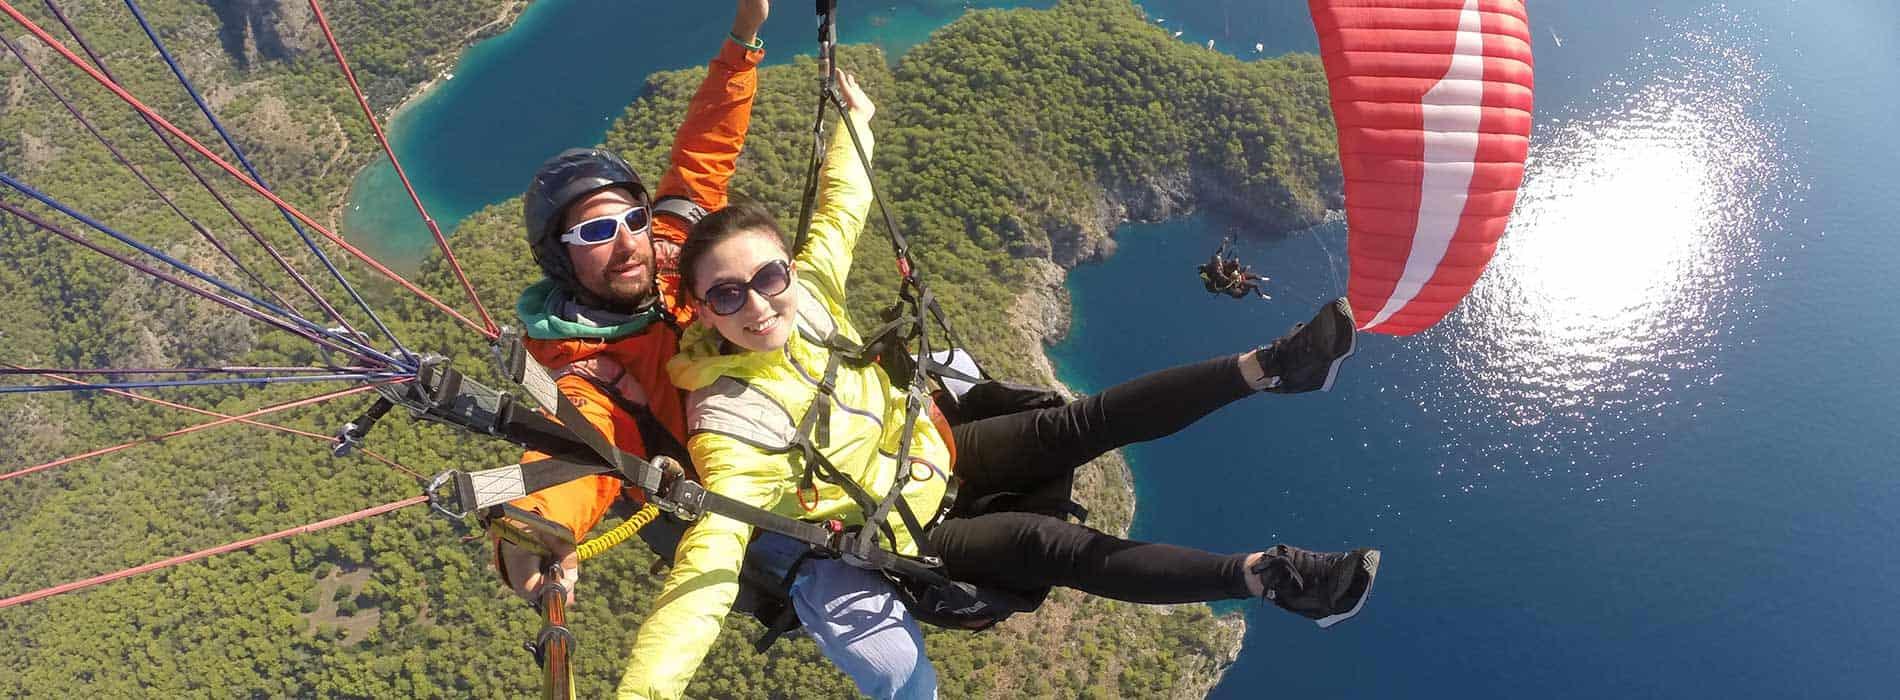 ReAction-Paragliding